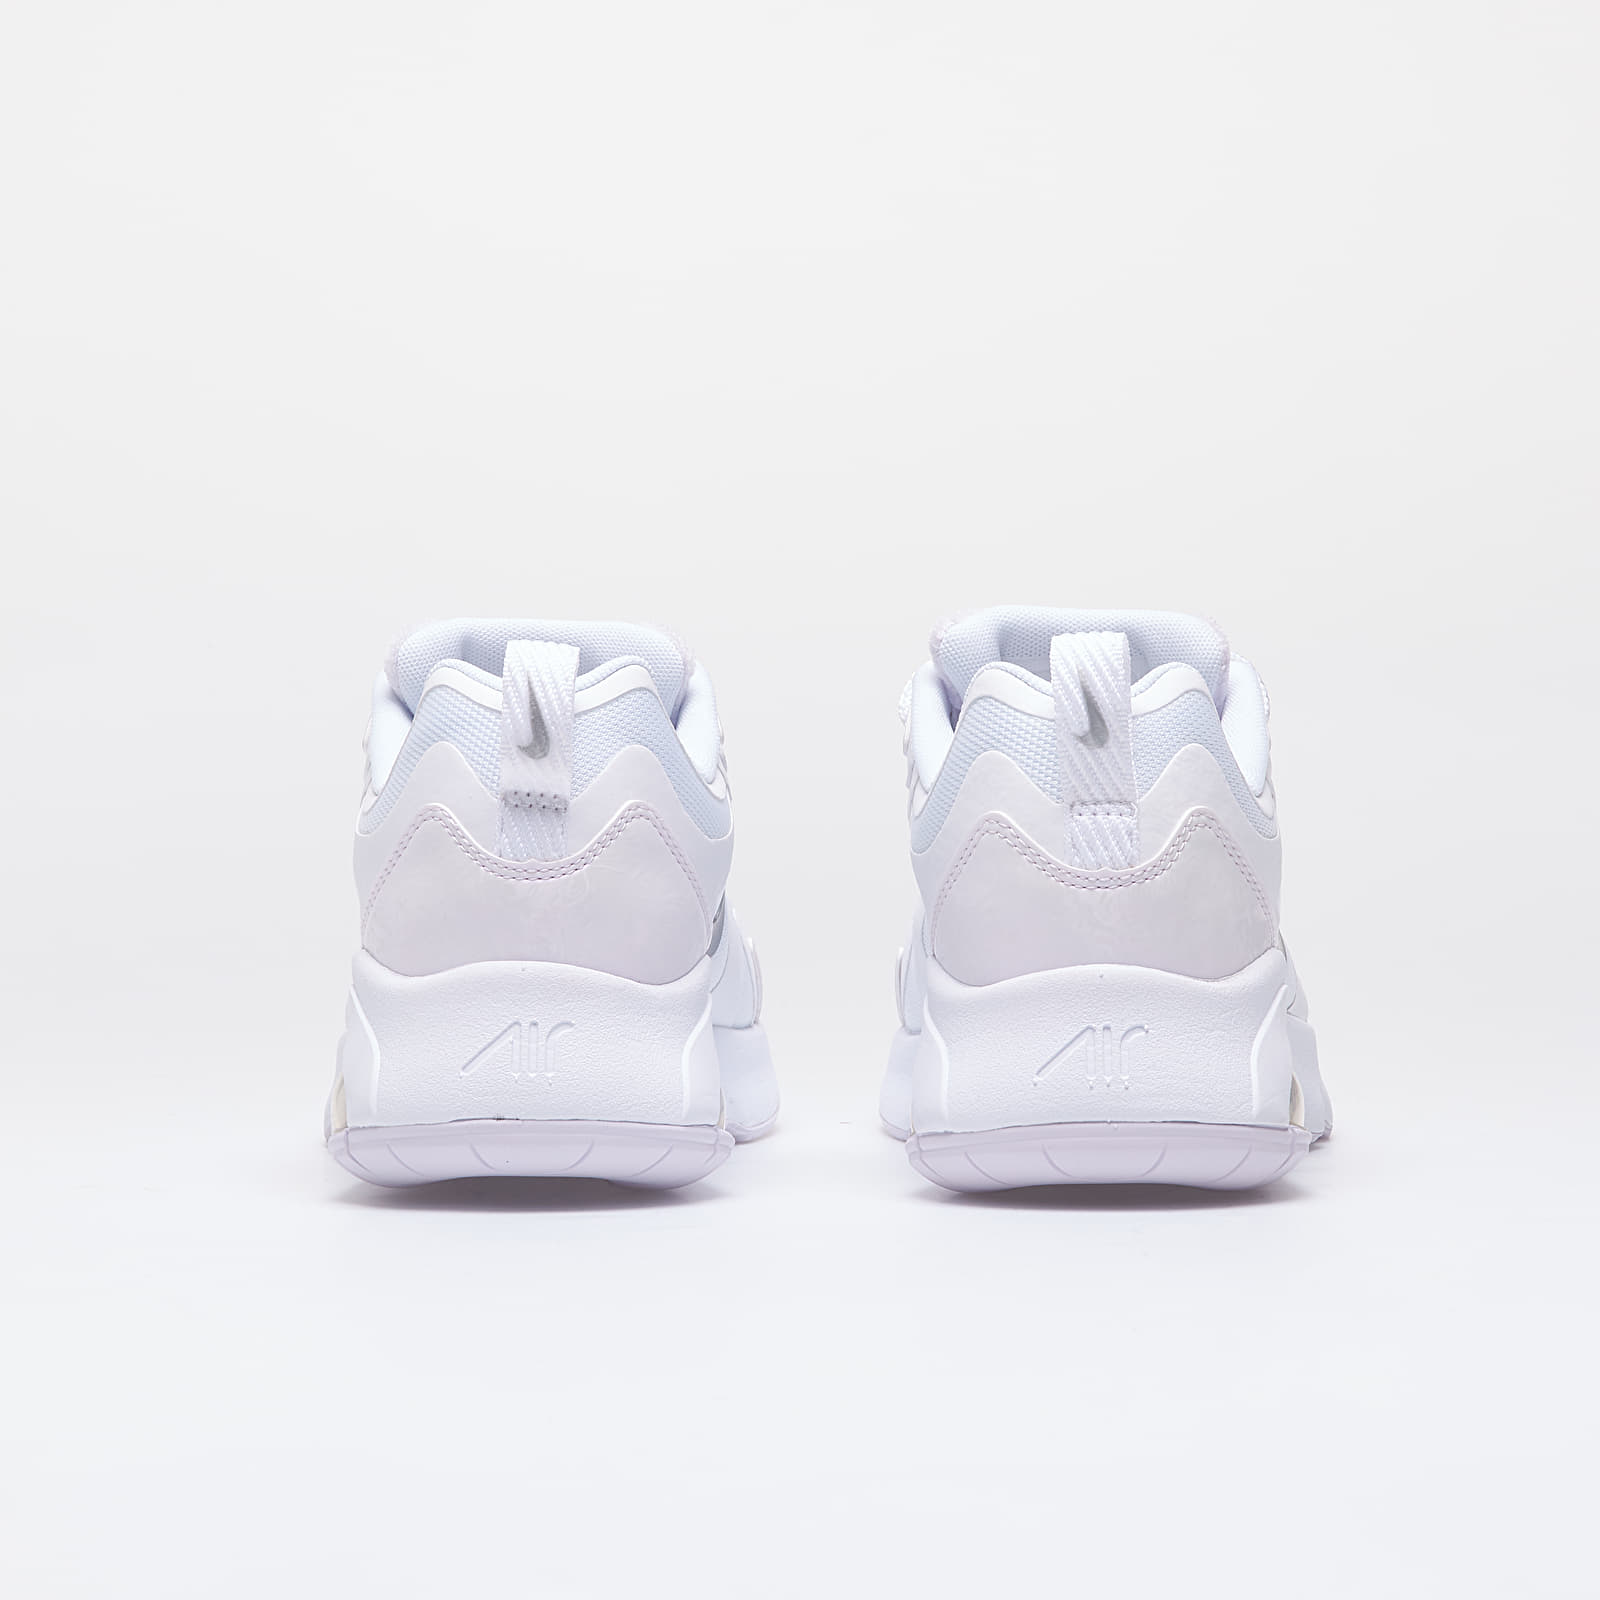 Nike Wmns Air Max 200 White Barely Grape Metallic Silver